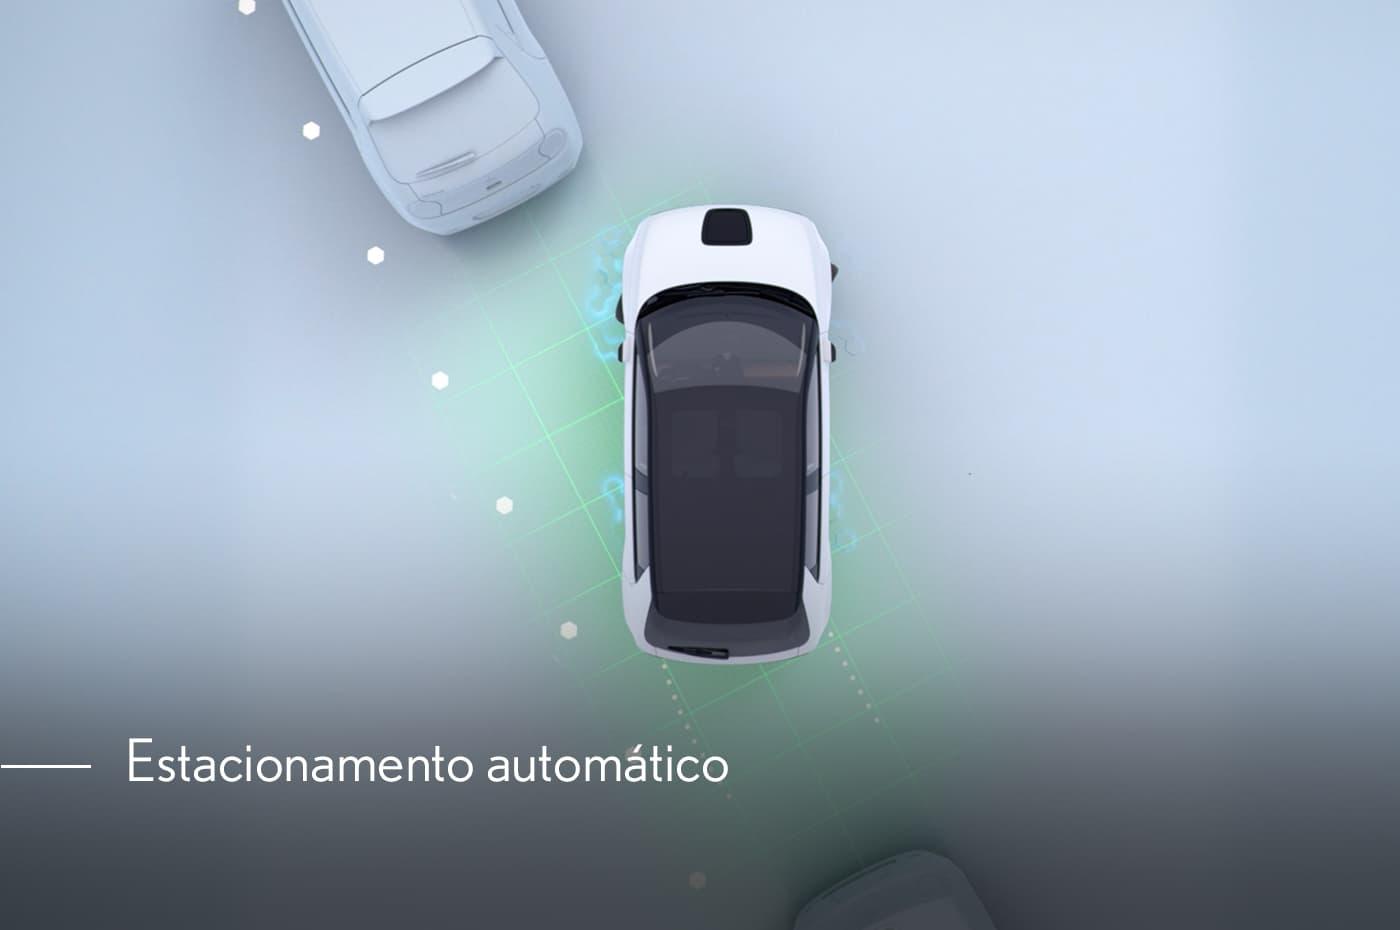 Estacionamento automatico